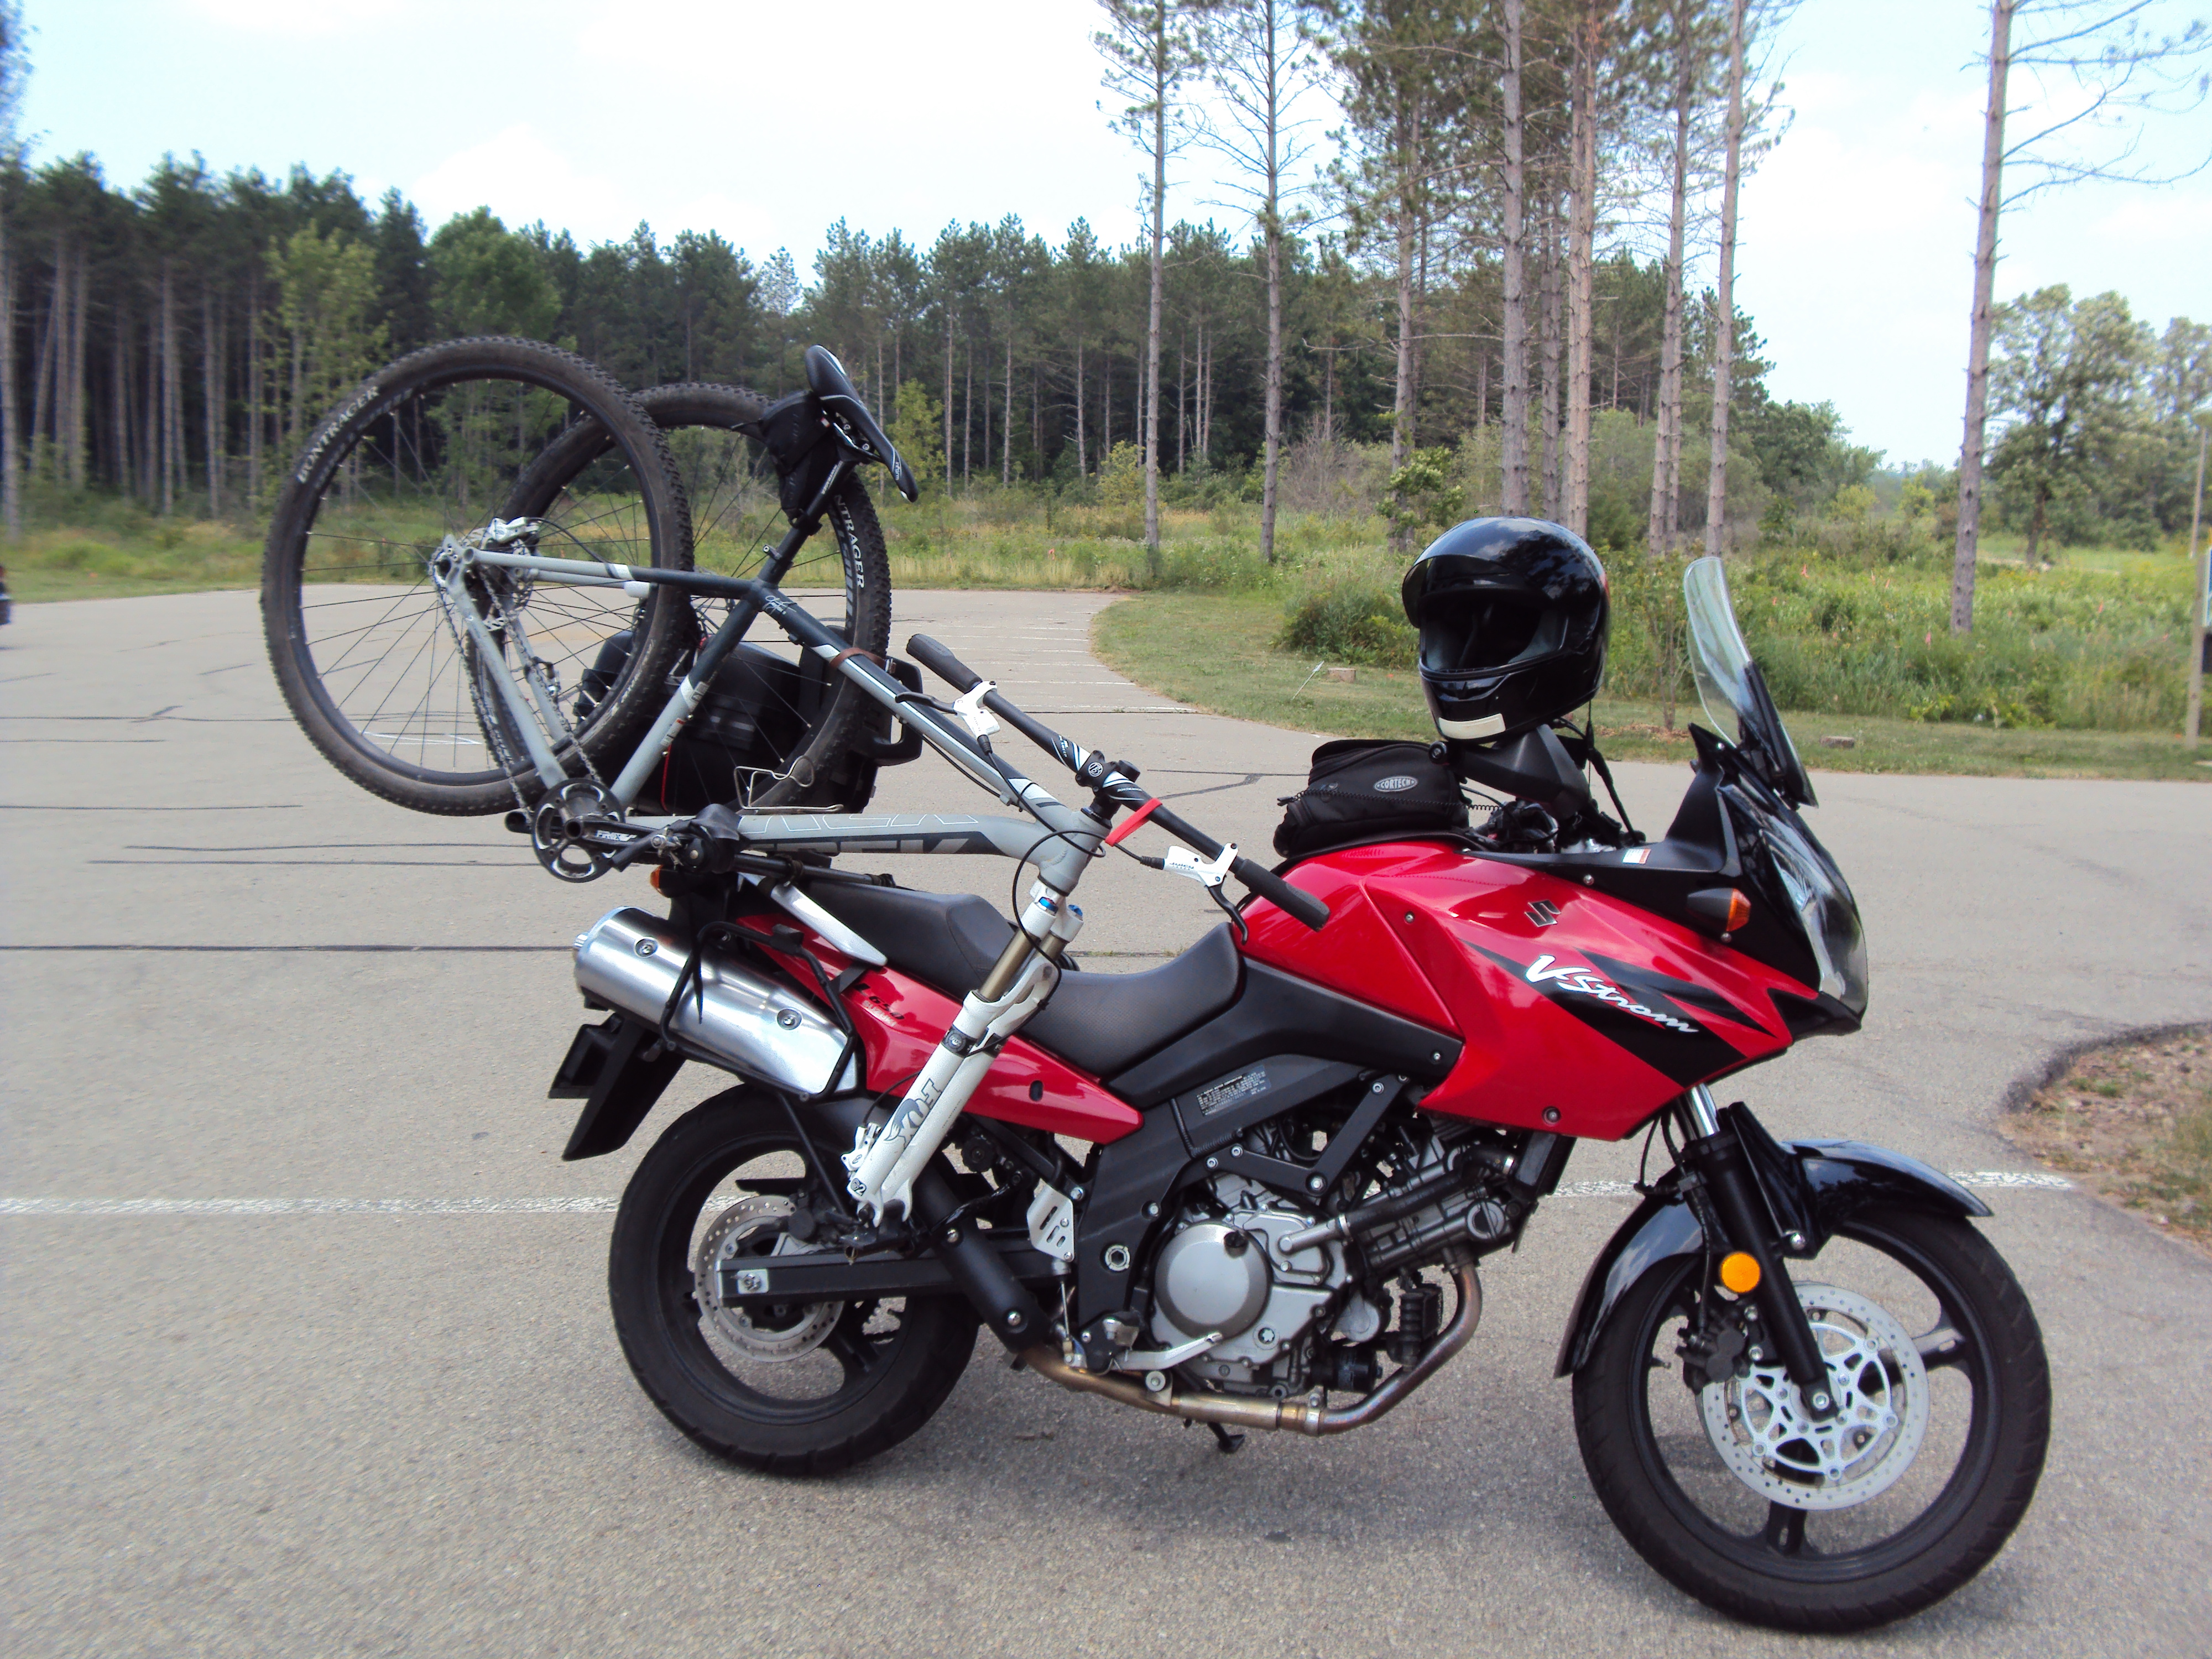 020 Singletracks Mountain Bike News